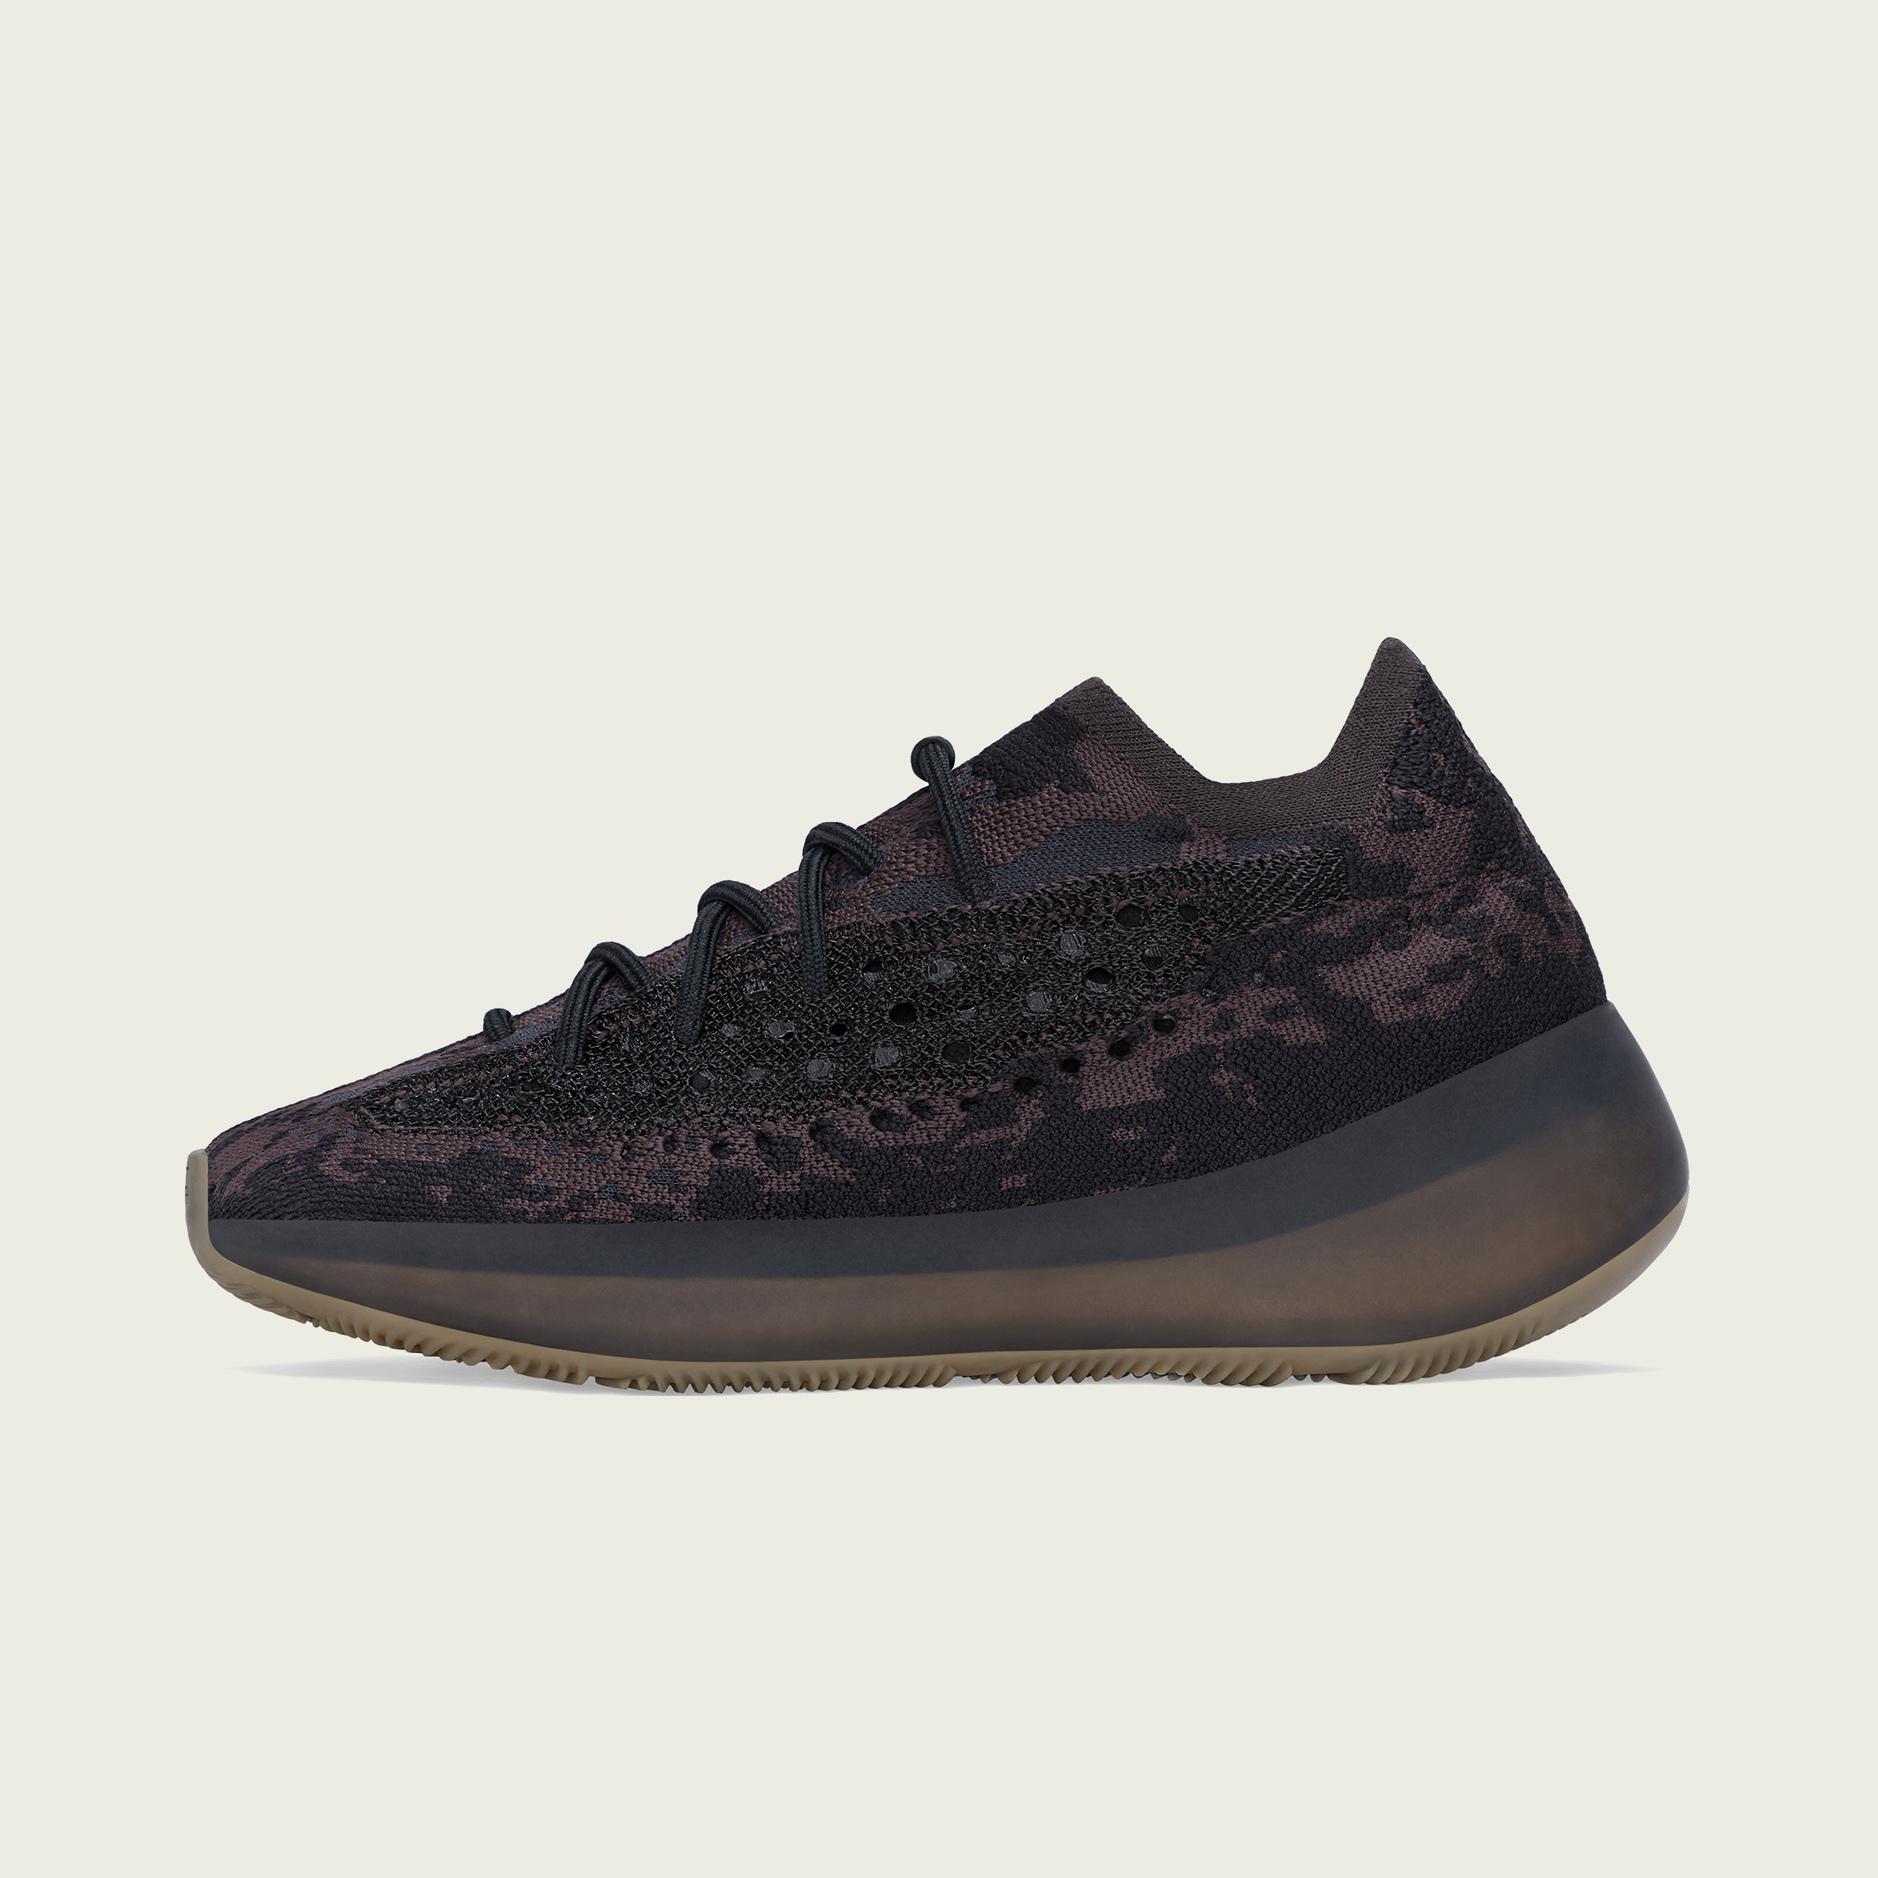 adidas Yeezy Boost 380 Onyx/ Onyx/ Onyx EUR 39 1/3